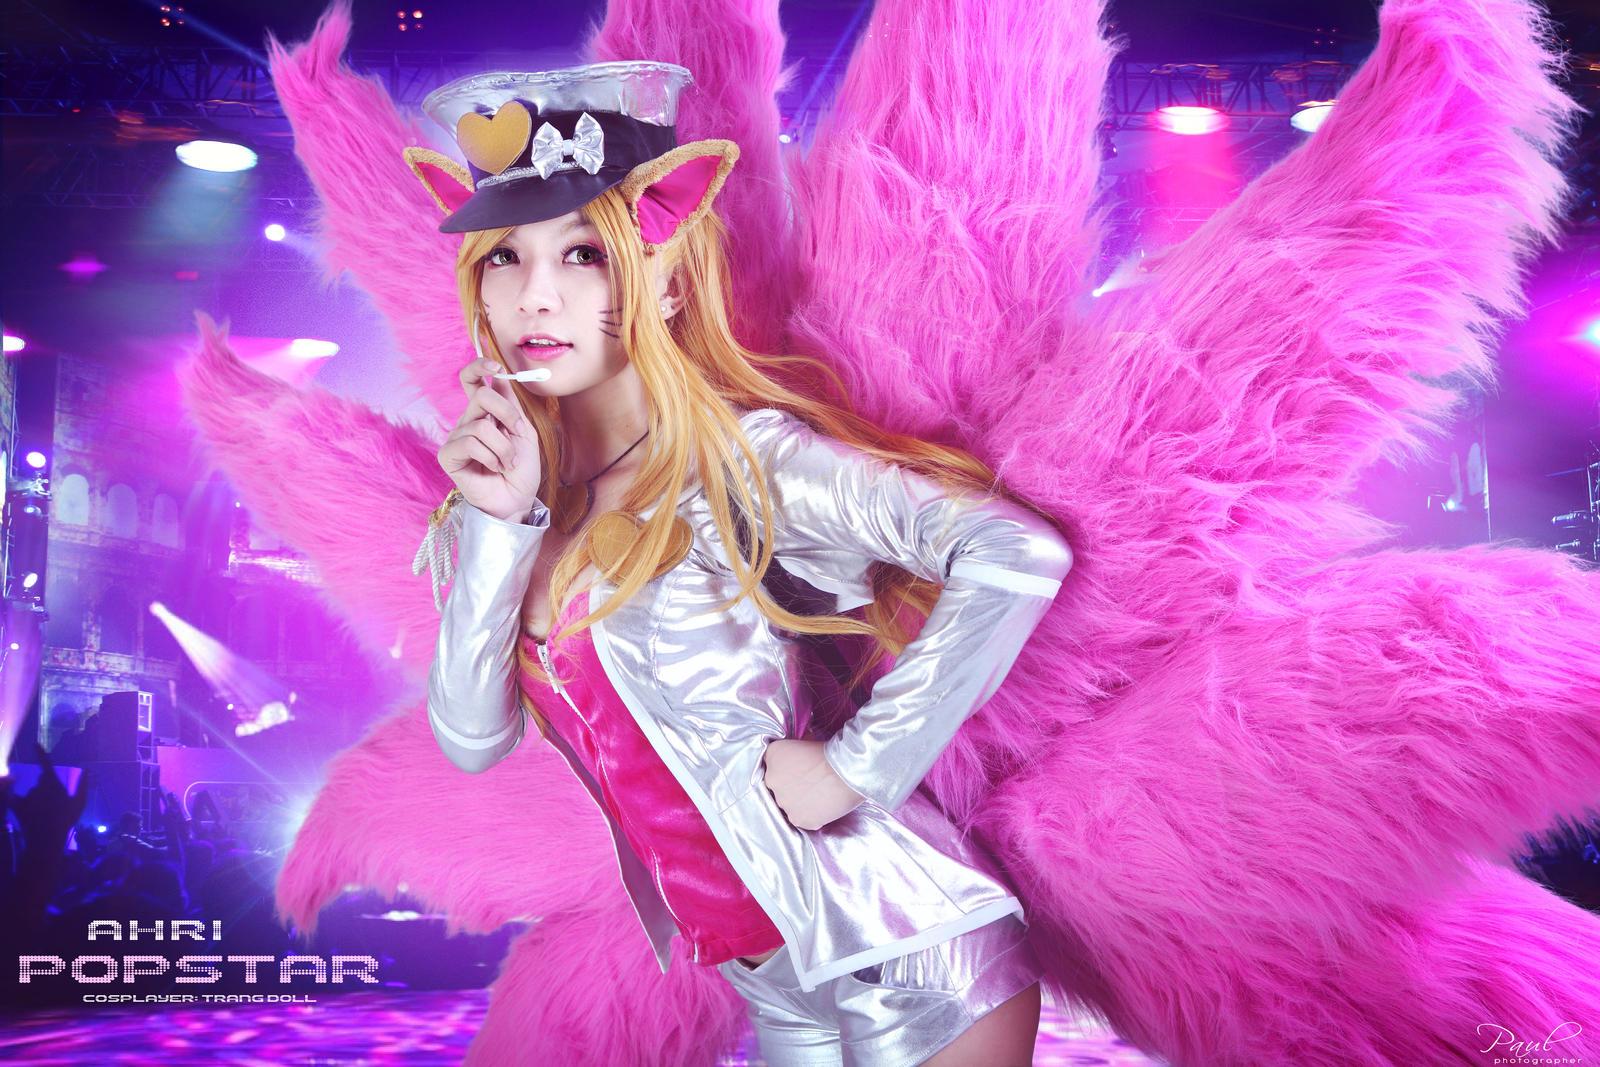 Ahri popstar by ZhanZao